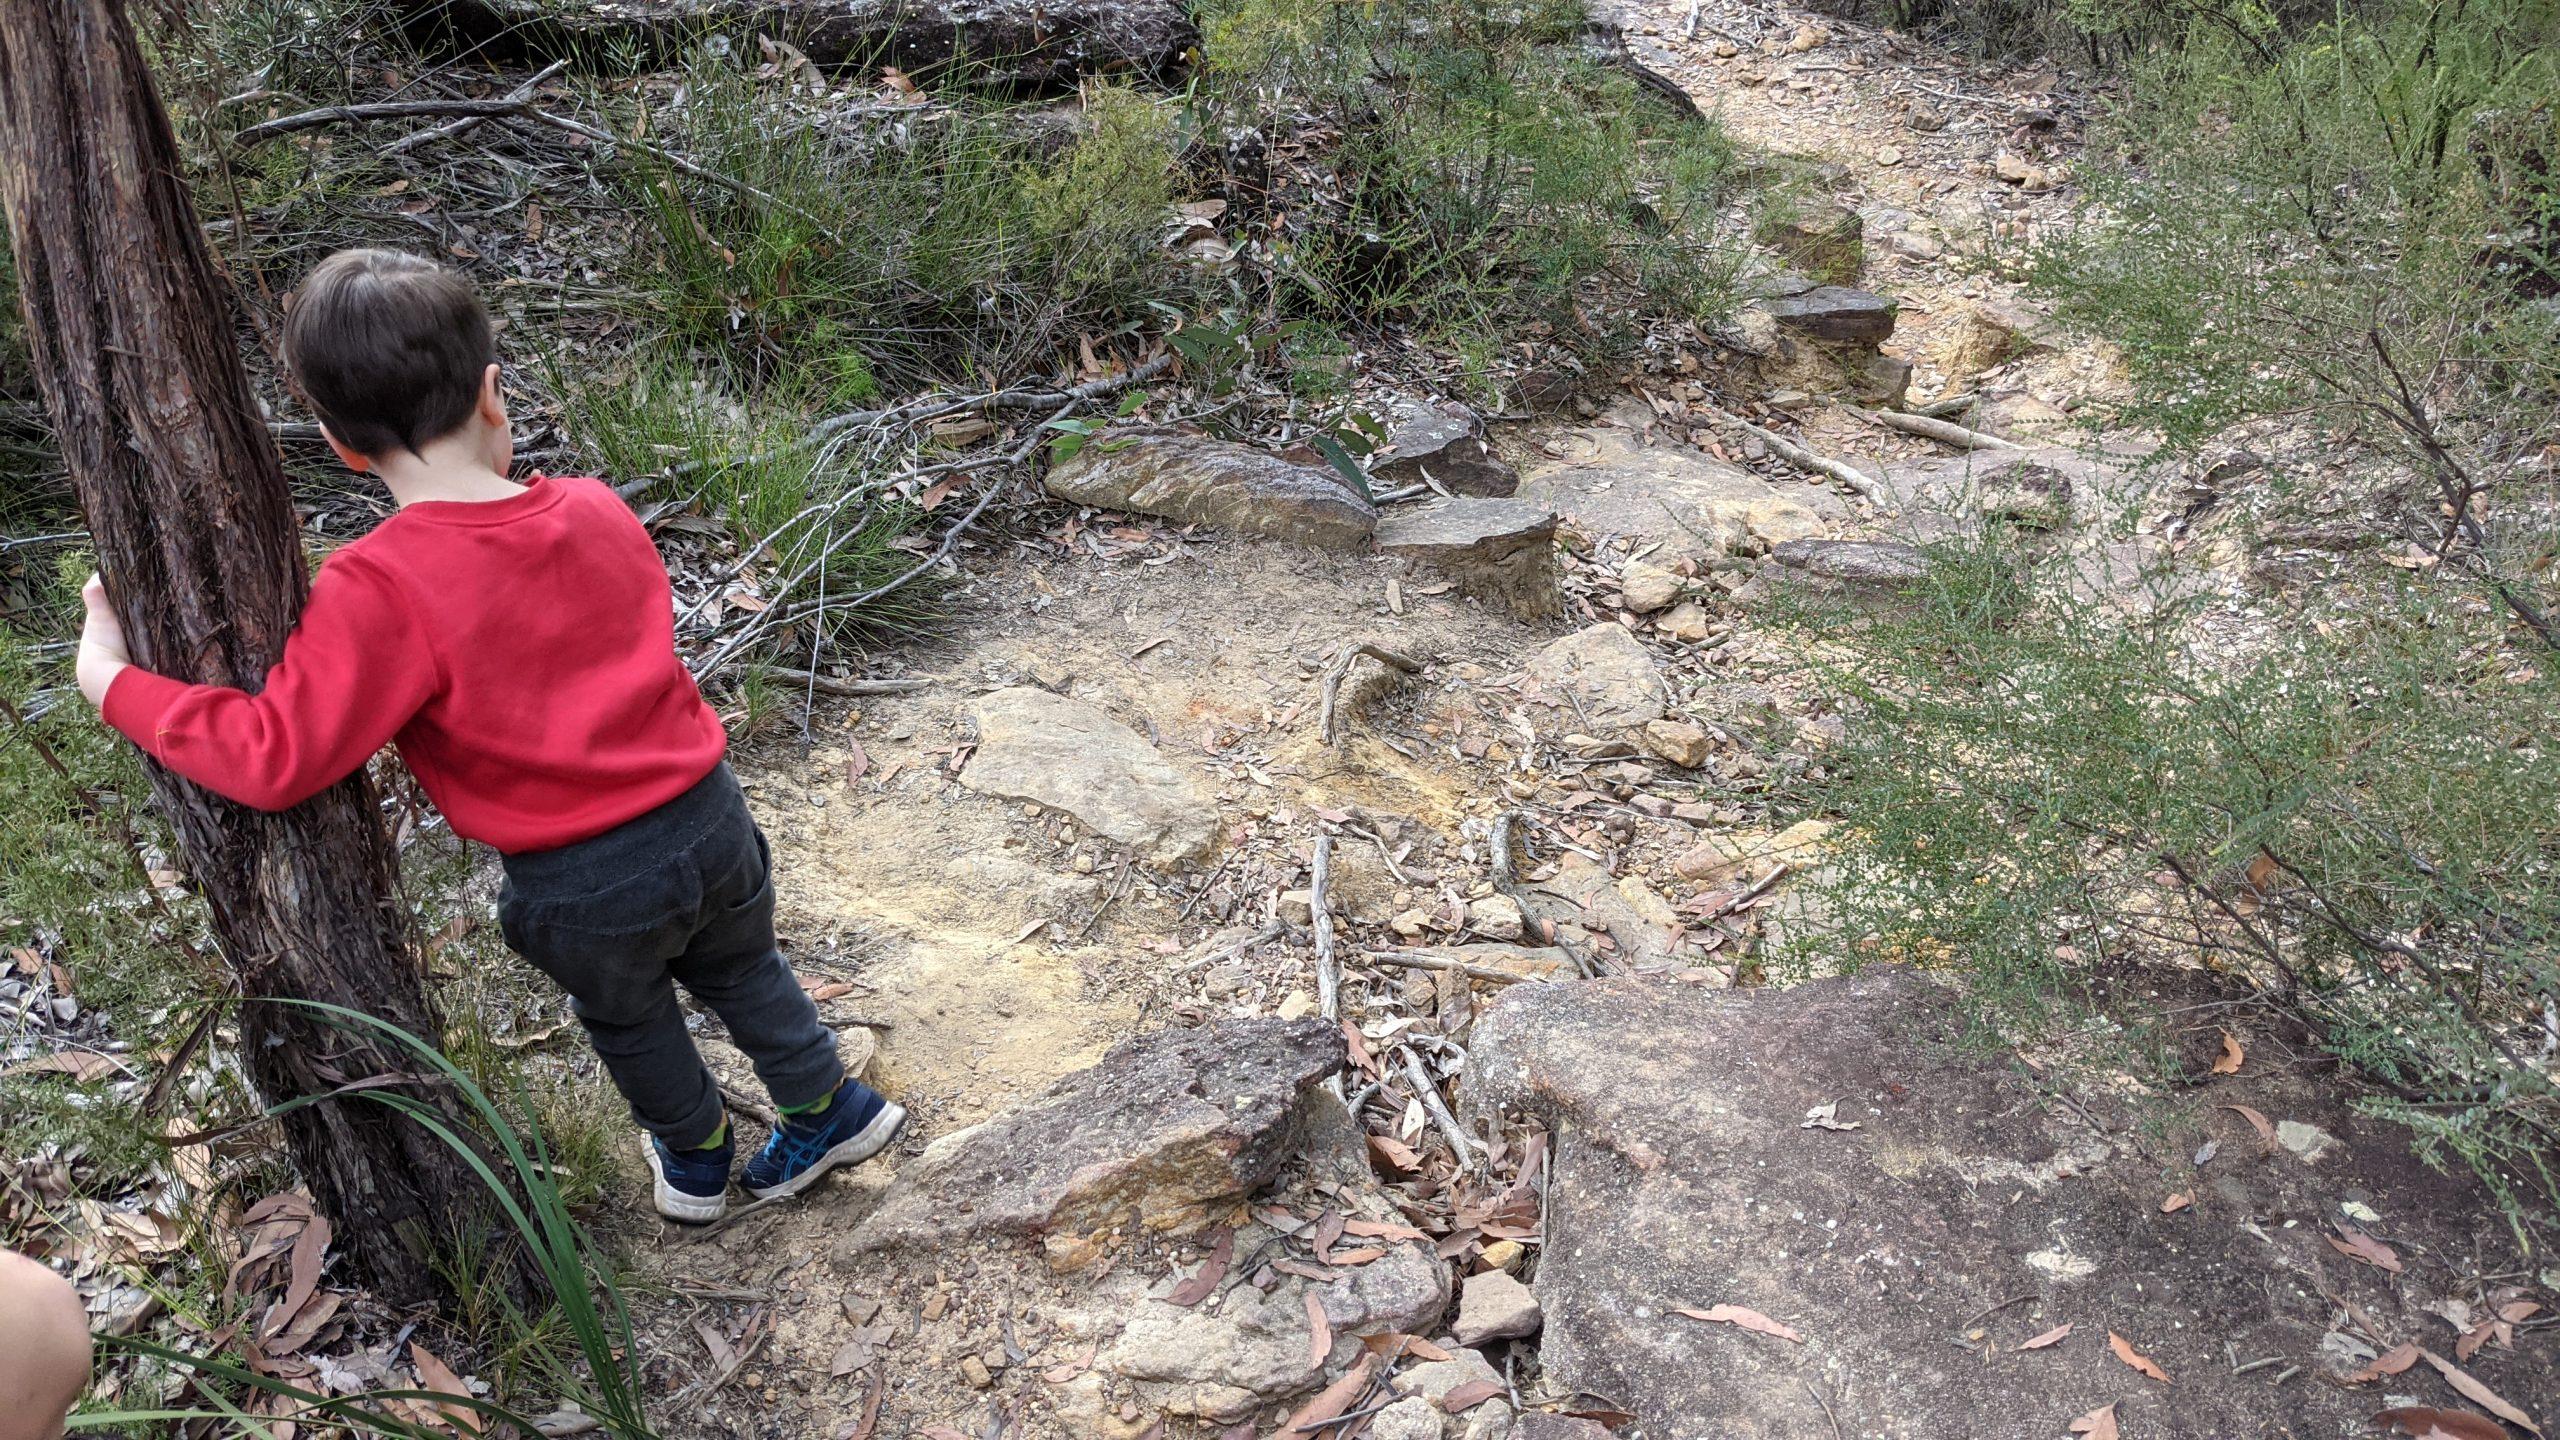 Duck Hole Track Glenbrook boy carefully climbing down rocks